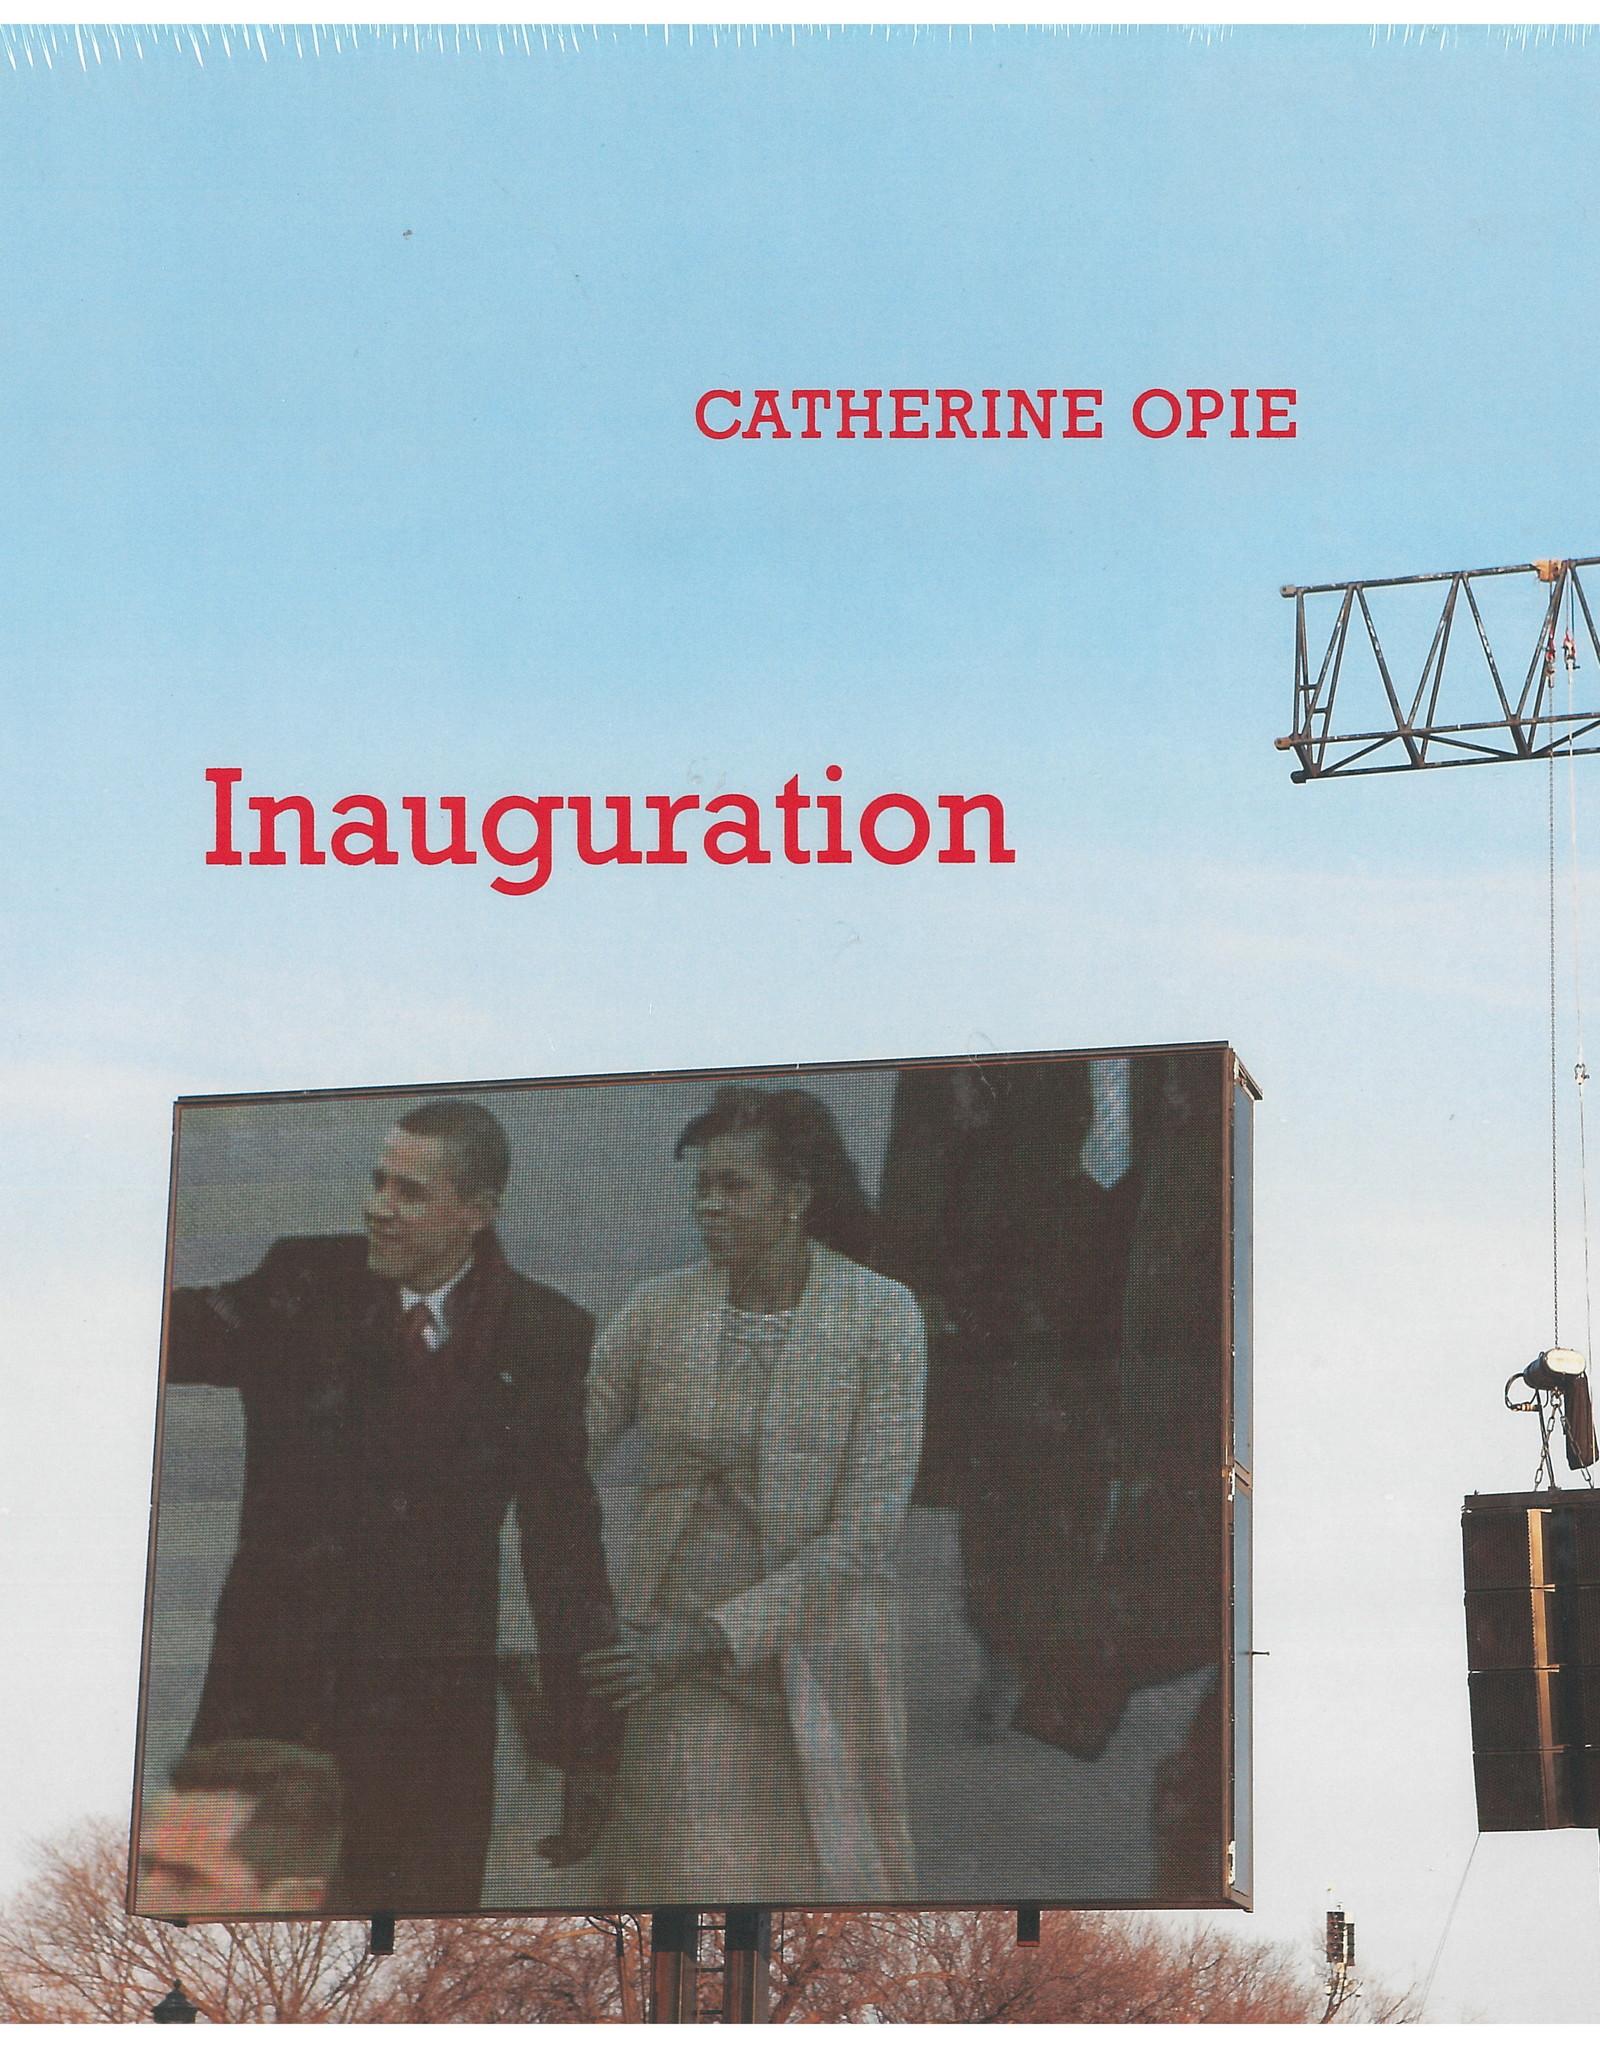 Inauguration / Catherine Opie